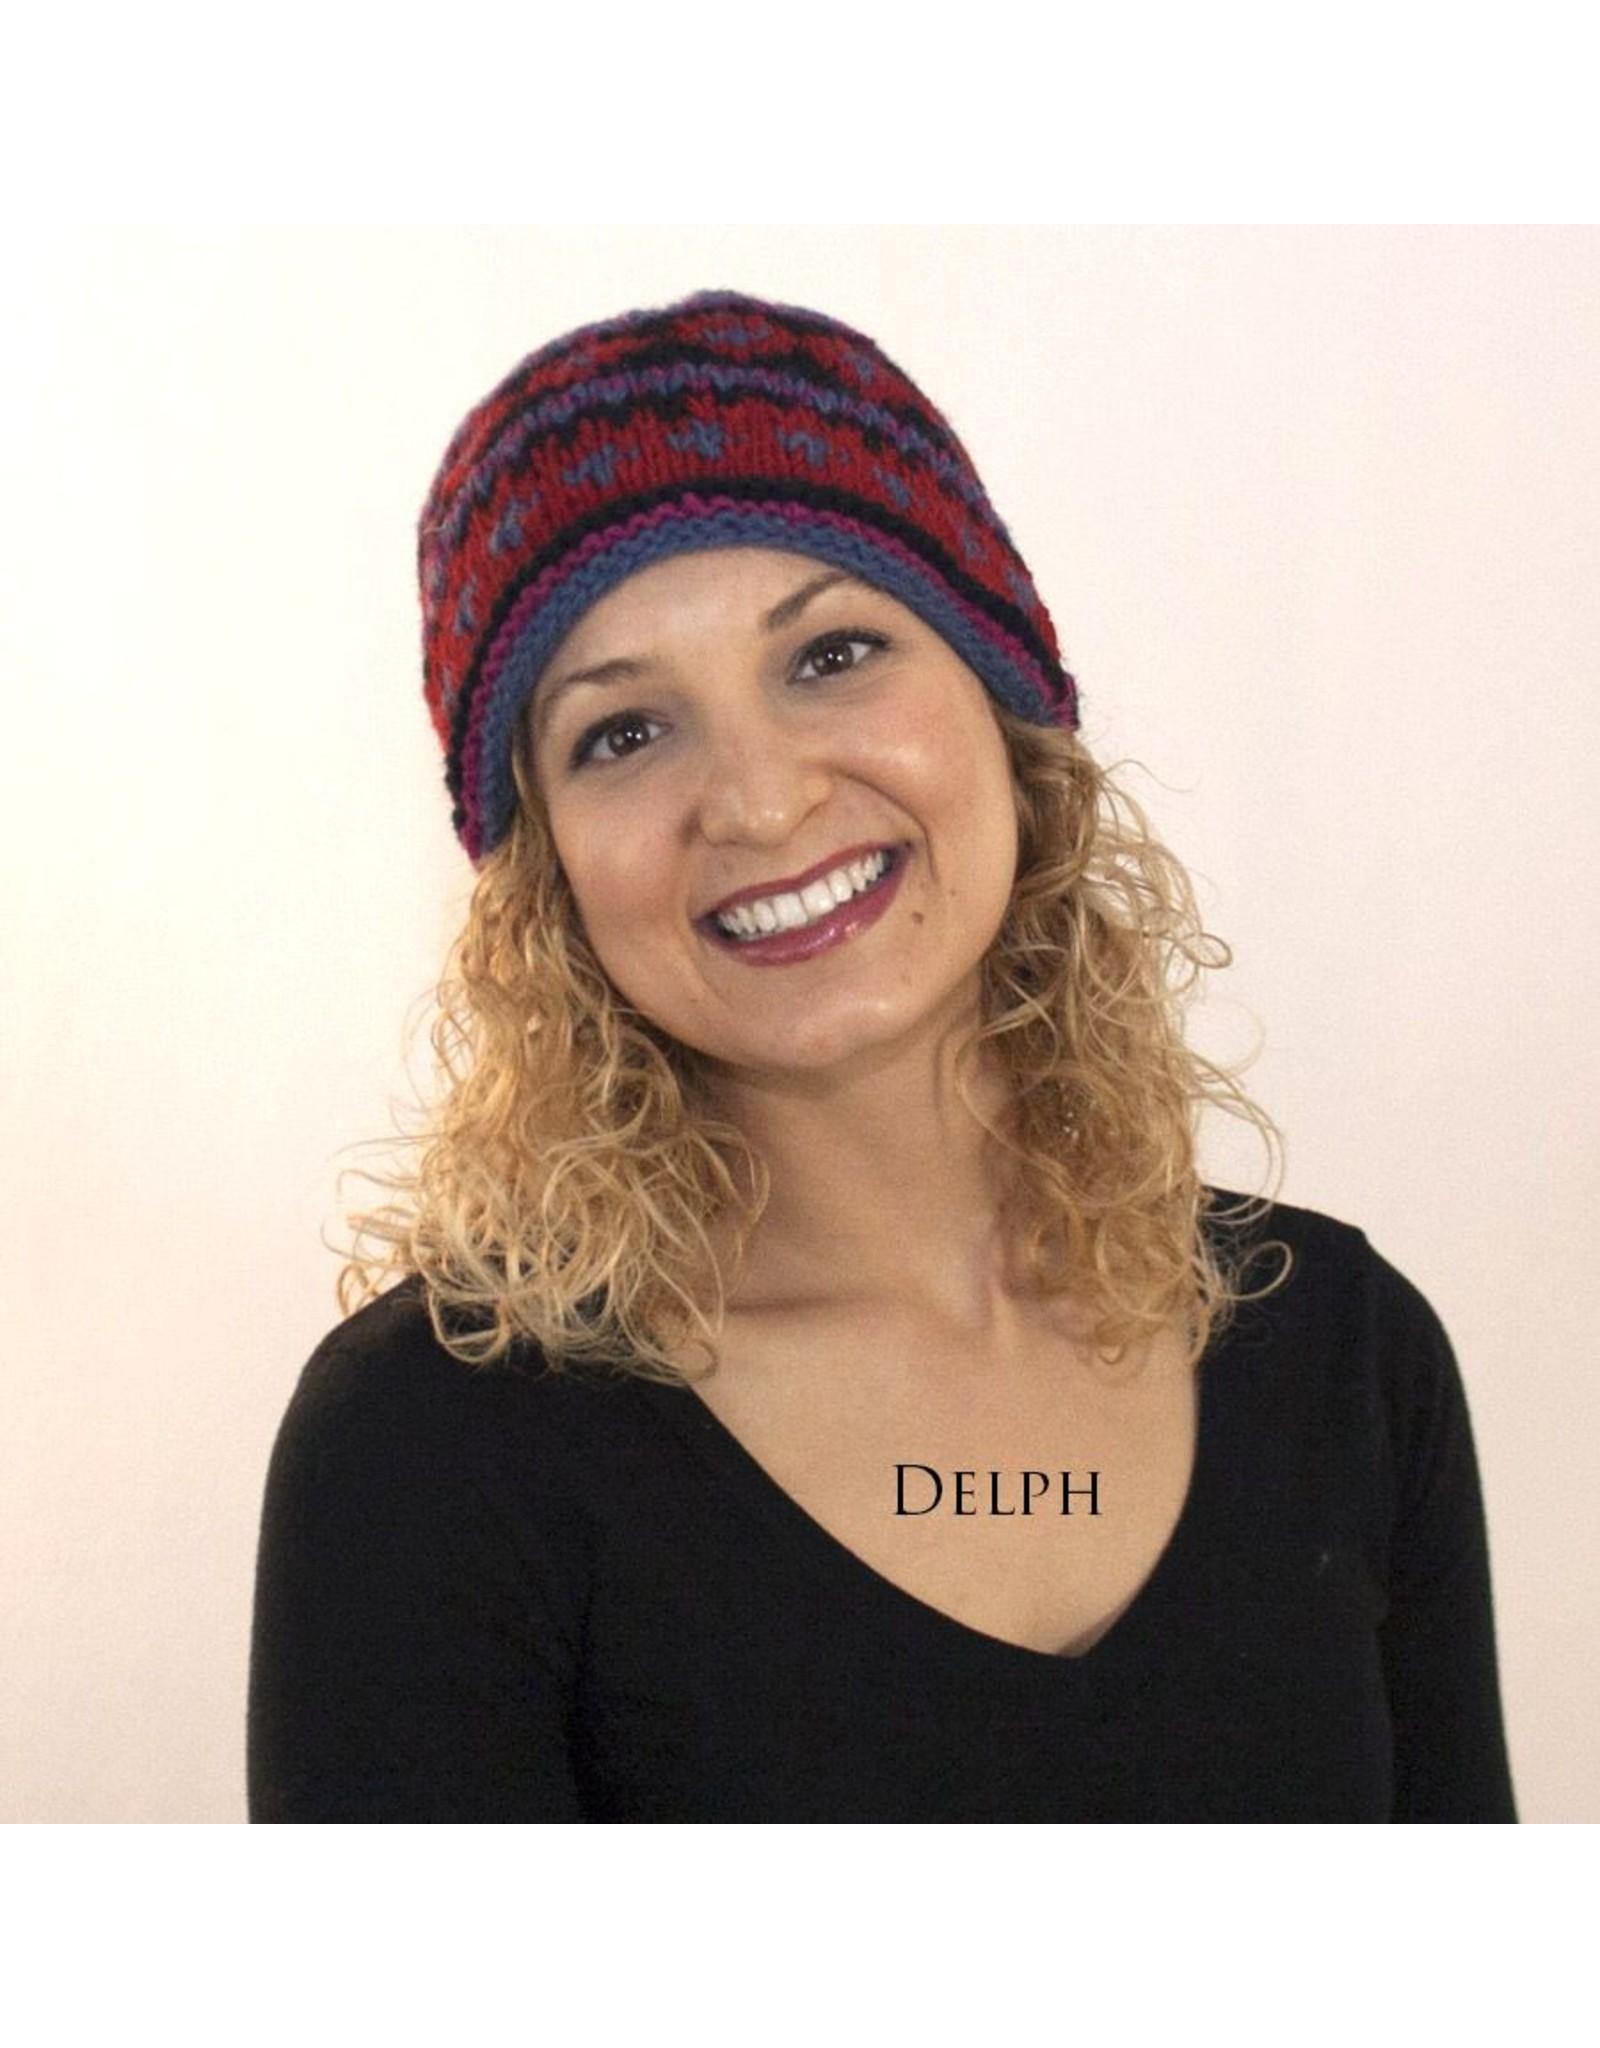 The Sweater Venture MultiDesign Hat